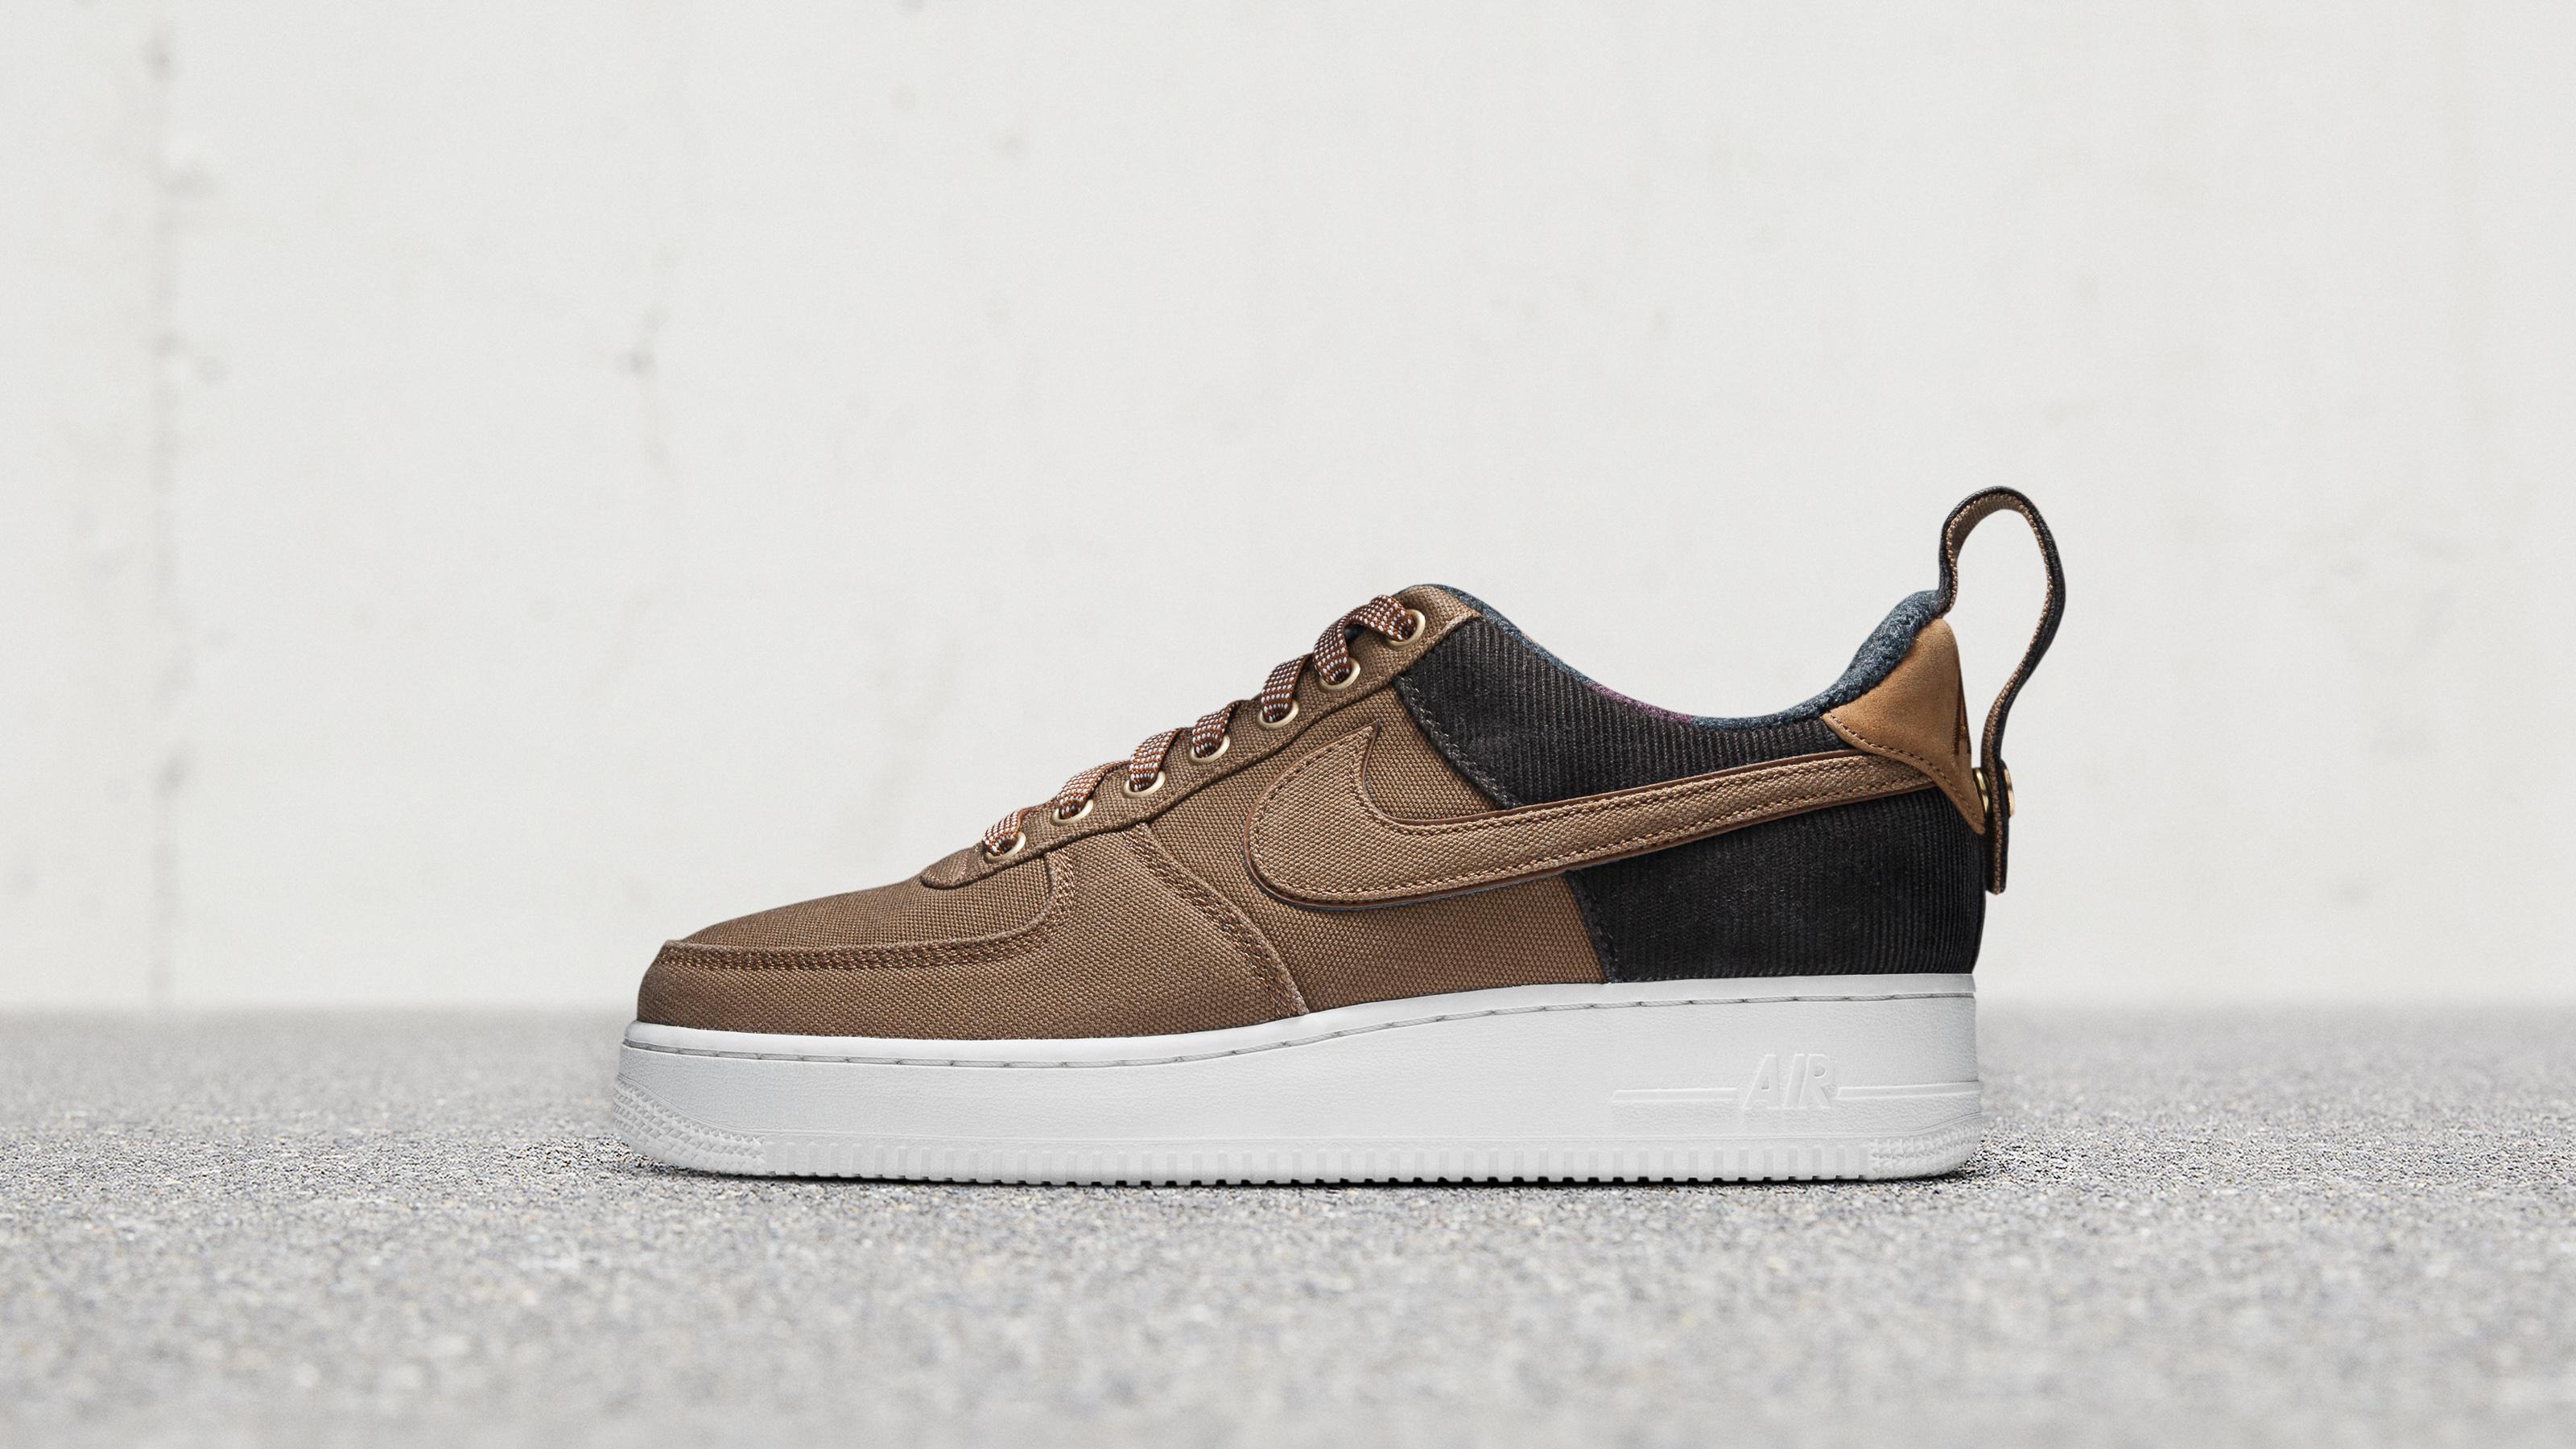 Nike x Carhartt WIP Air Force 1 Low